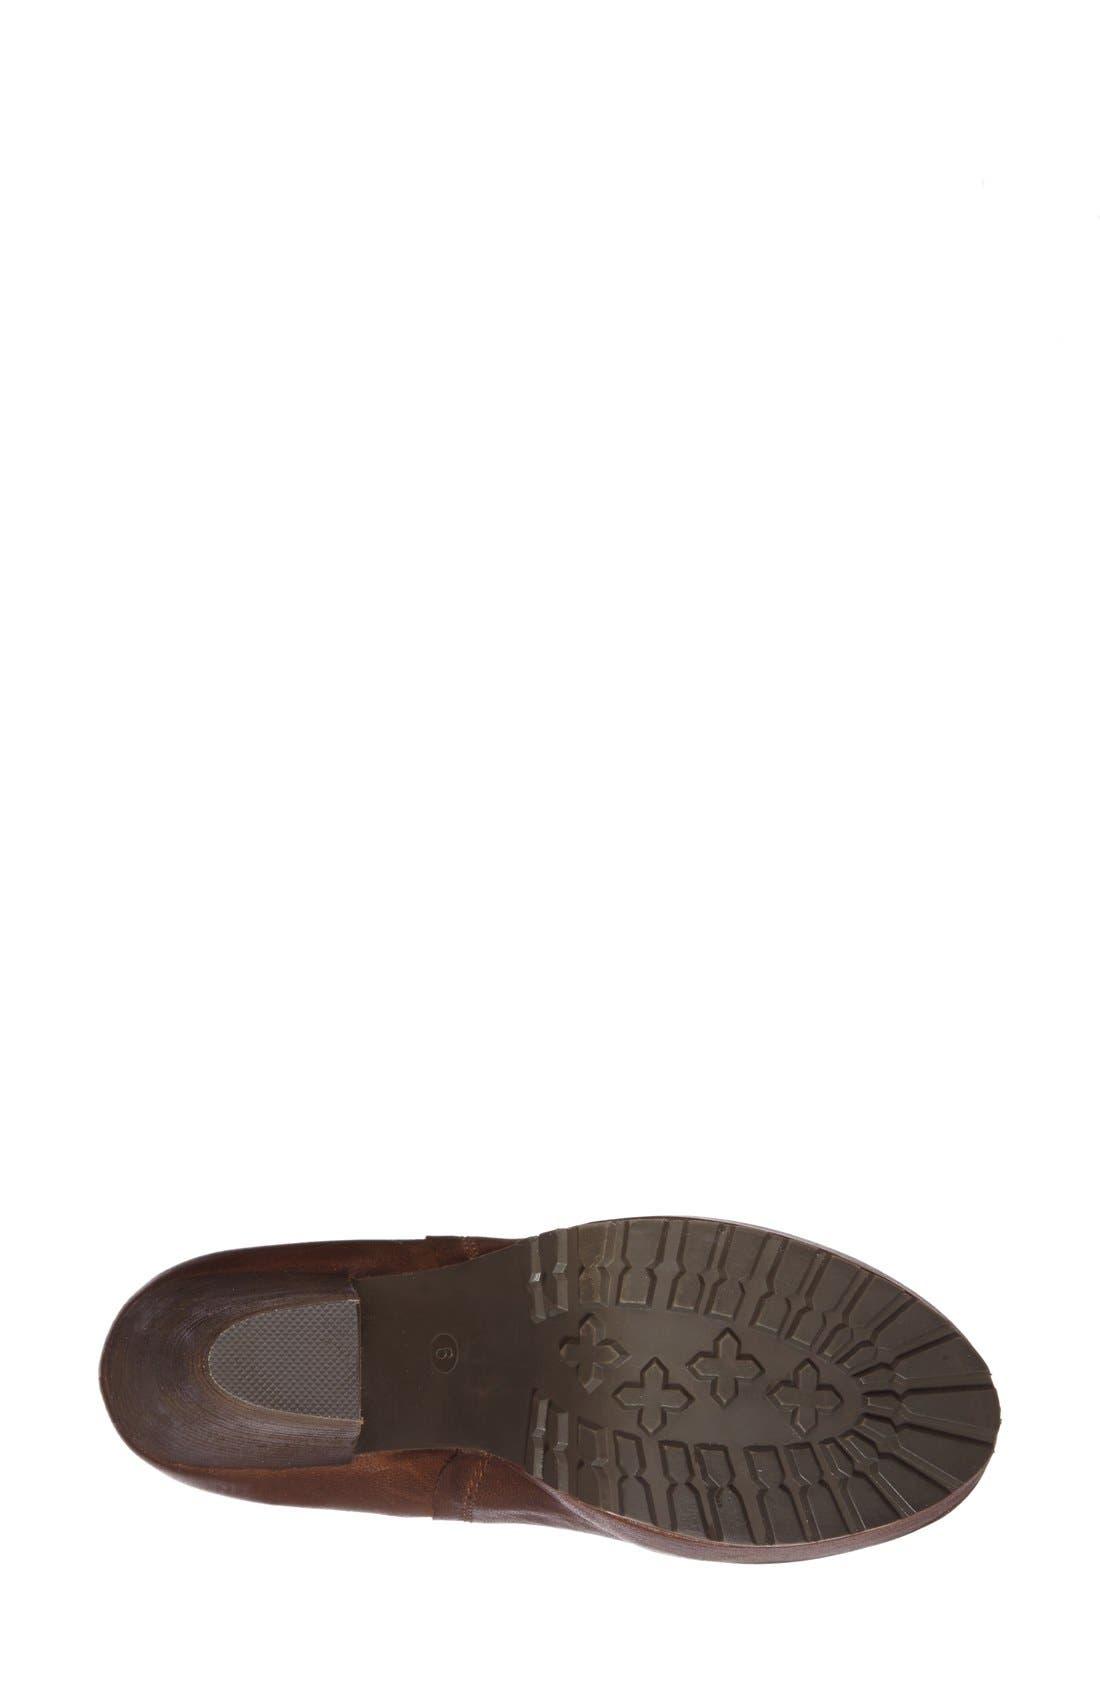 Alternate Image 4  - Steve Madden 'Randaal' Leather Platform Bootie (Women)